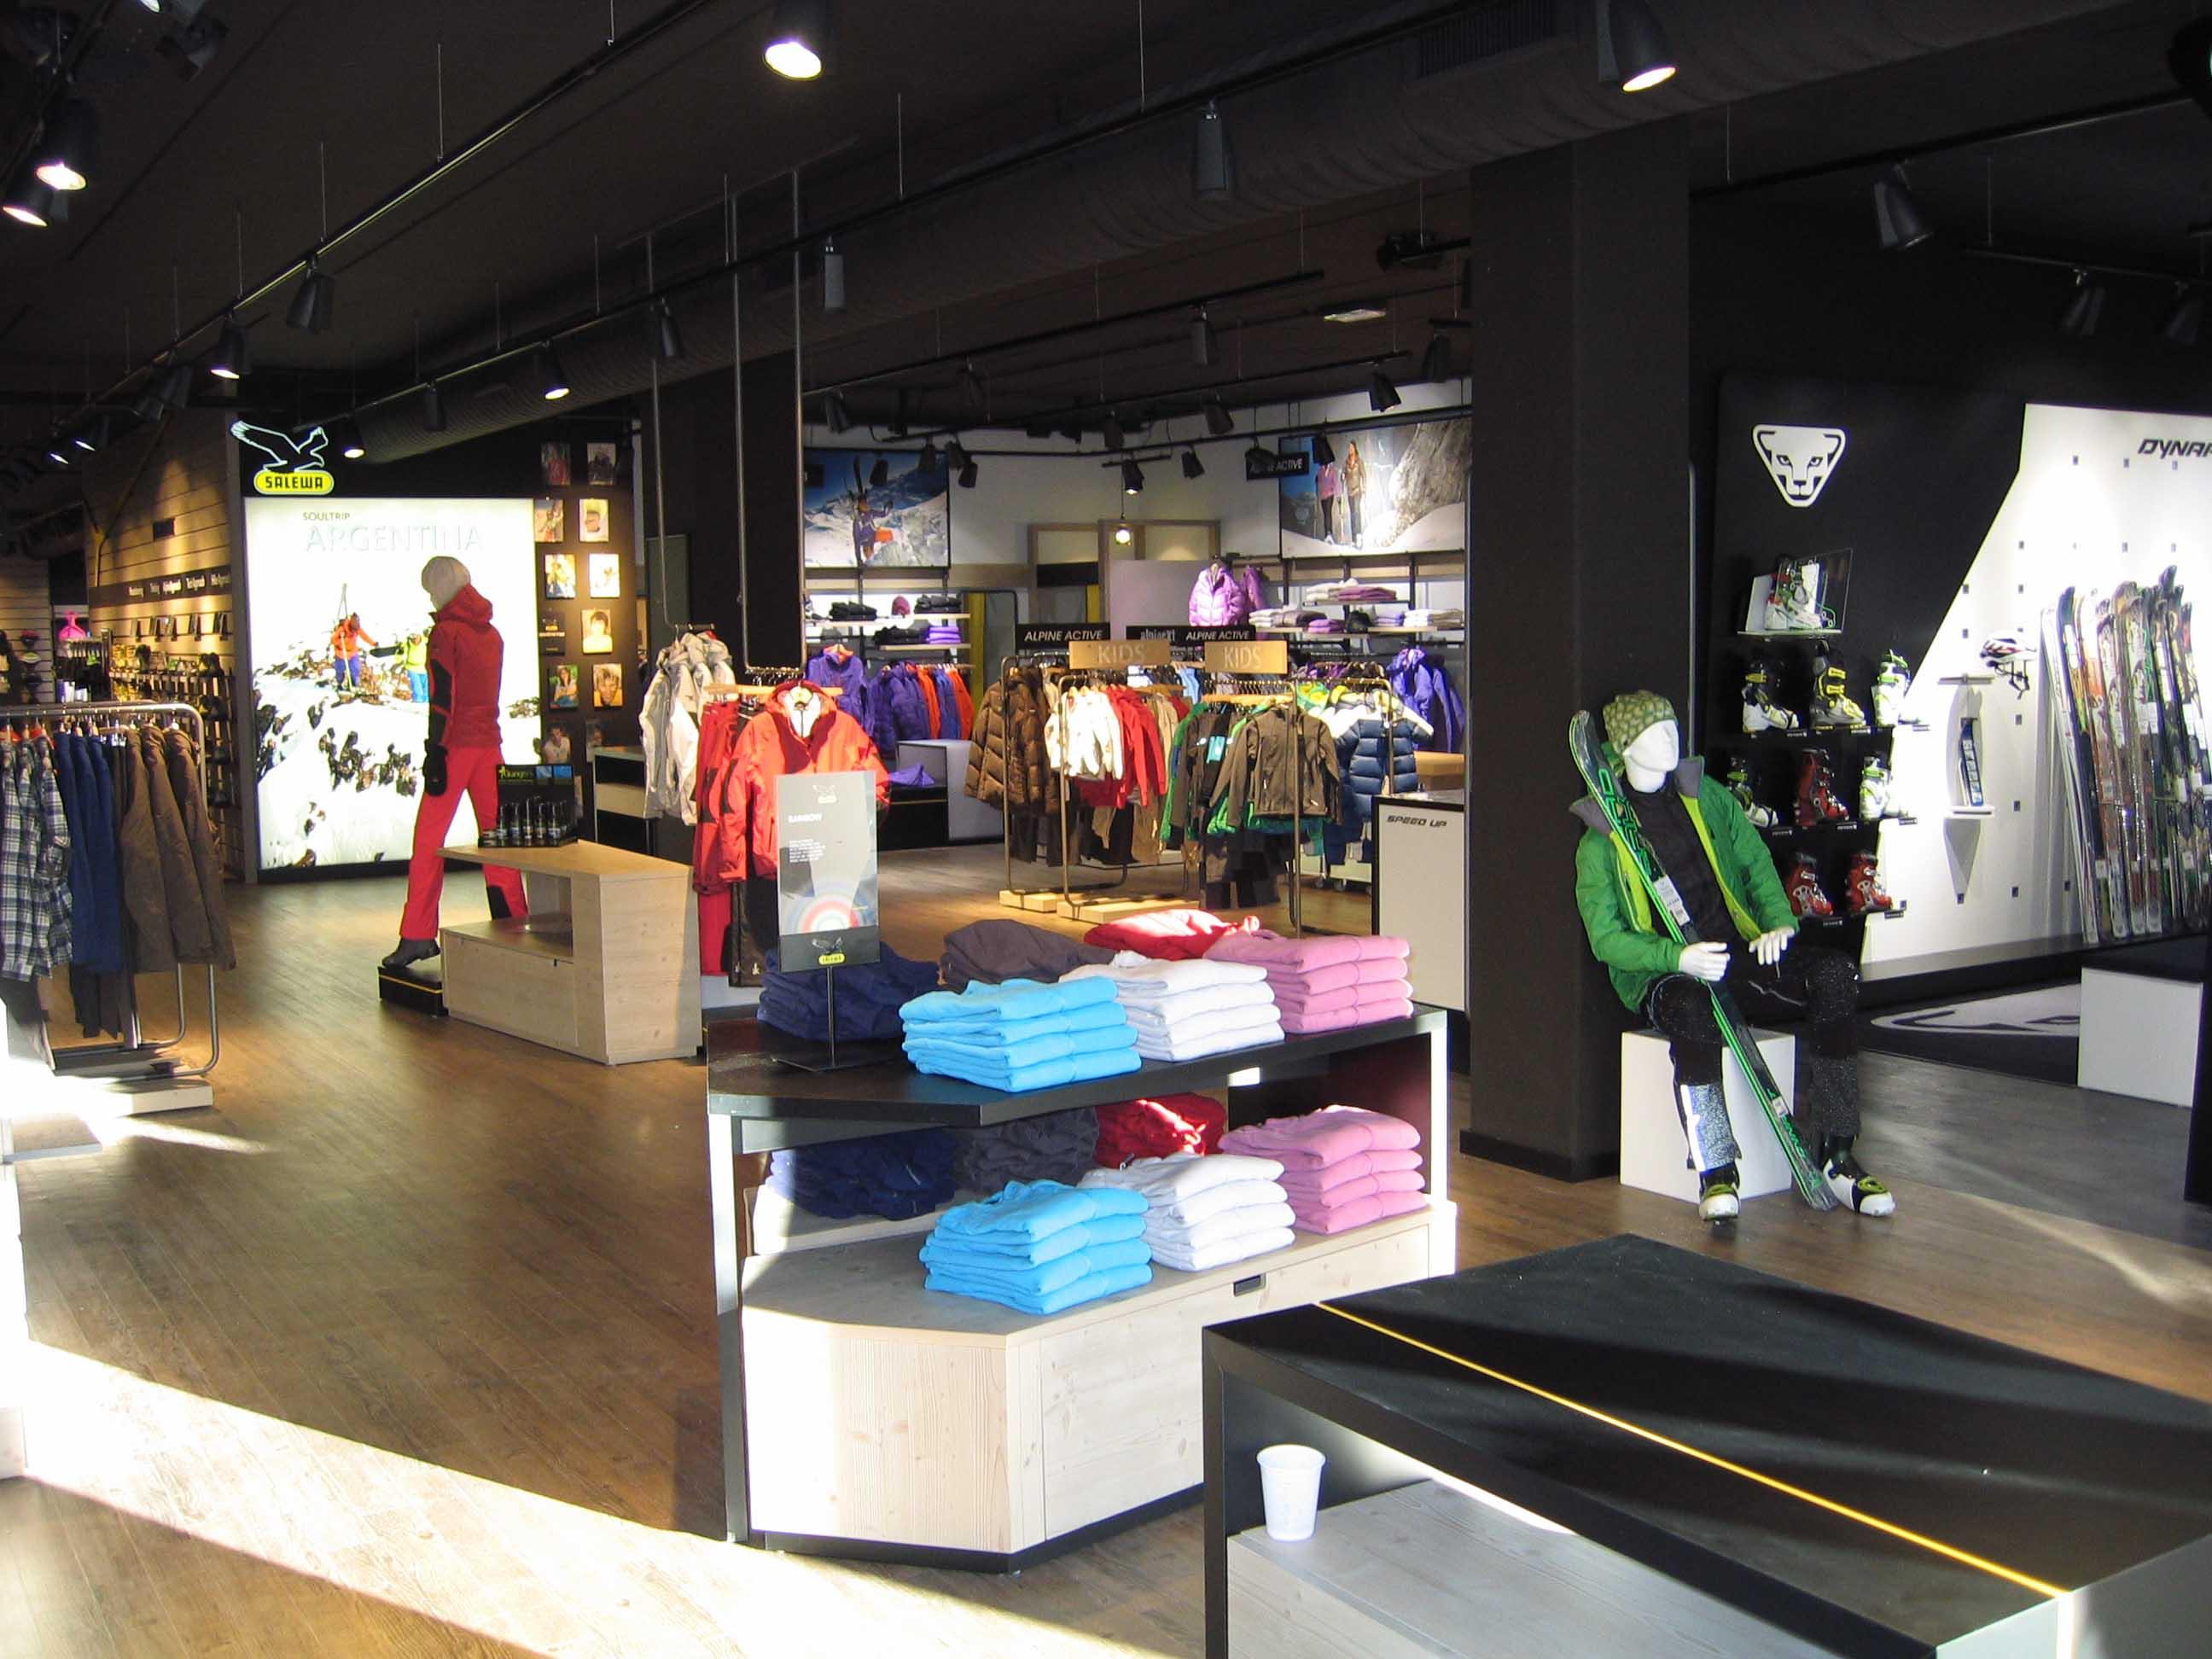 Nuovo Salewa Shop in Valtellina: intervista ad Heiner Oberrauch, Presidente di OberAlp